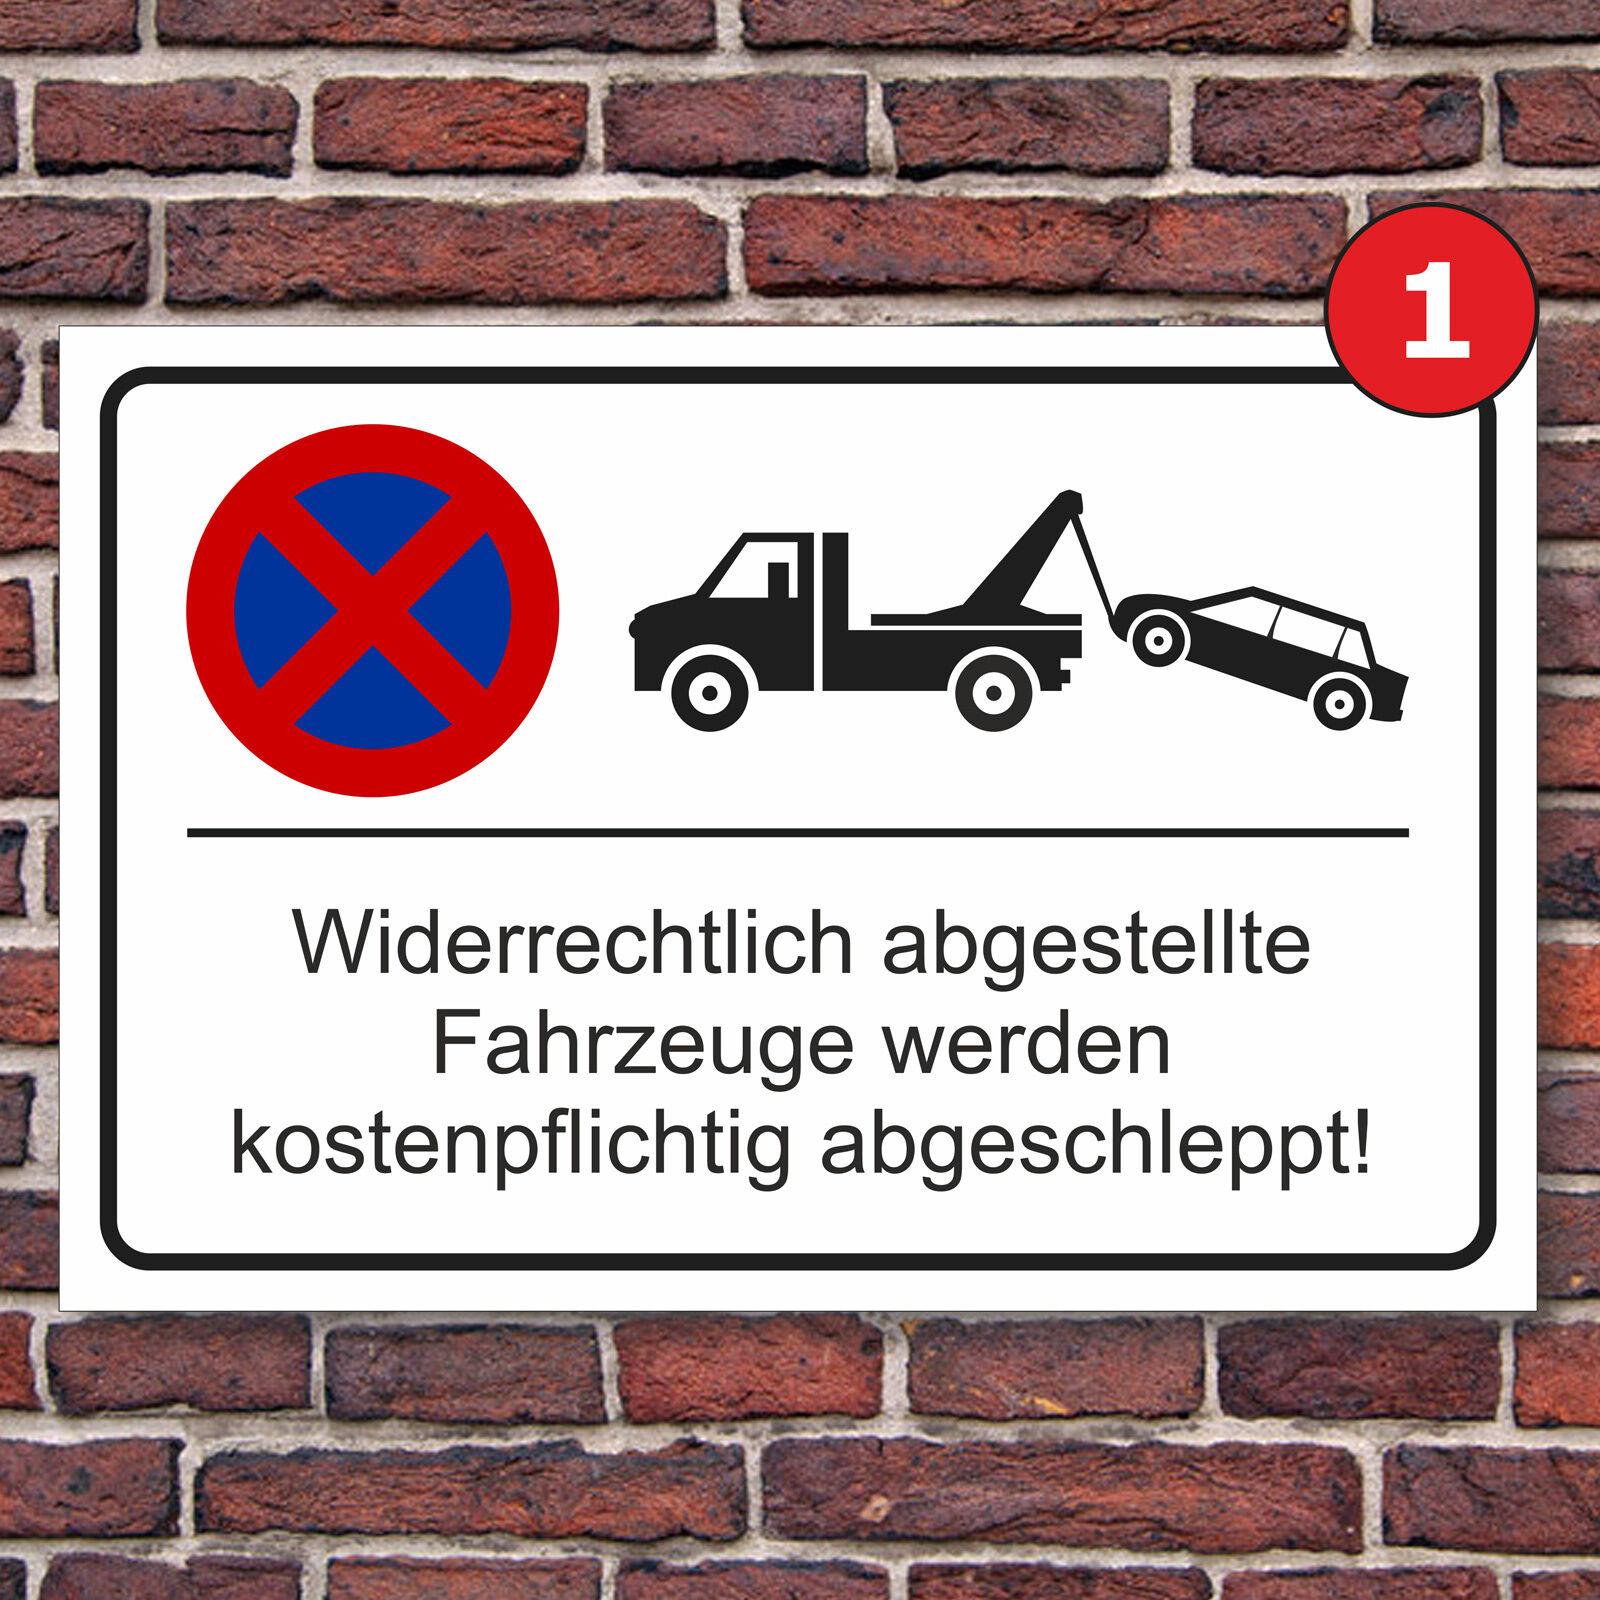 parkplatzschild parkverbot parken verboten halteverbot hinweisschild parkplatz eur 5 99. Black Bedroom Furniture Sets. Home Design Ideas